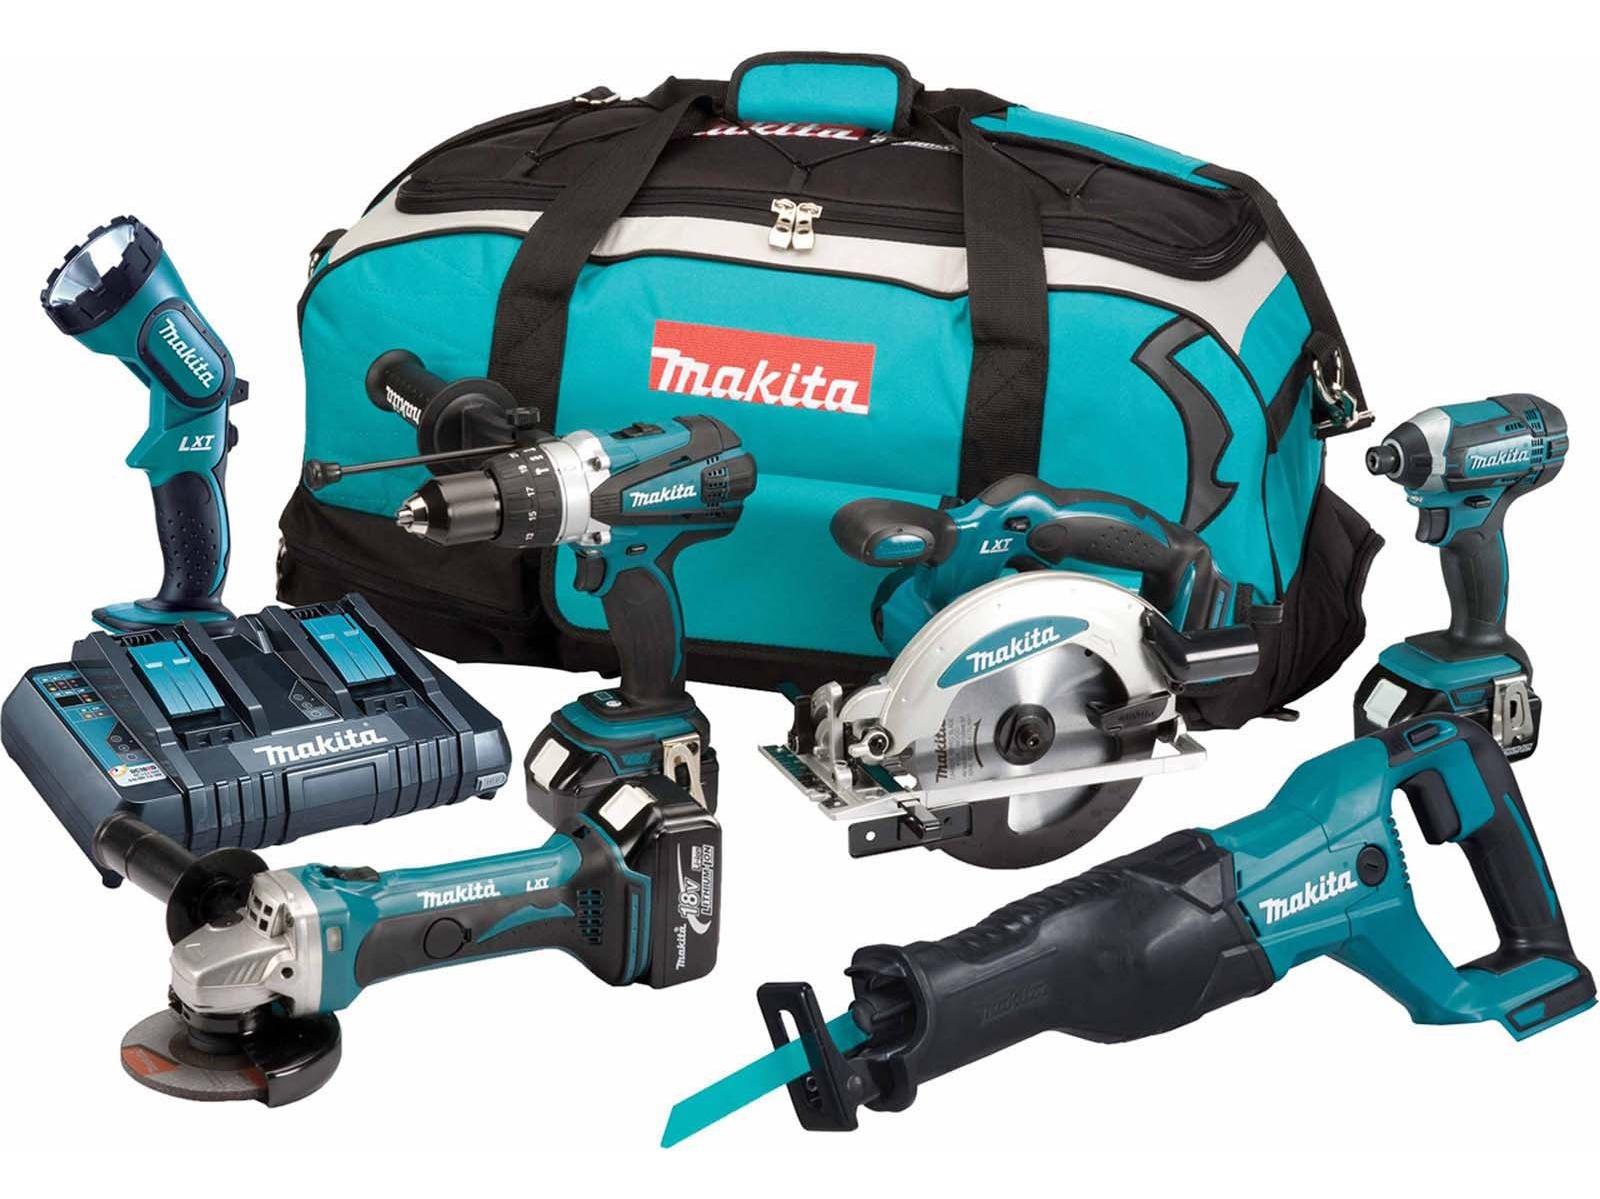 Makita 18V 6 Piece LXT Kit - Combi / Impact & More - DLX6072PT - 5.0Ah Pack